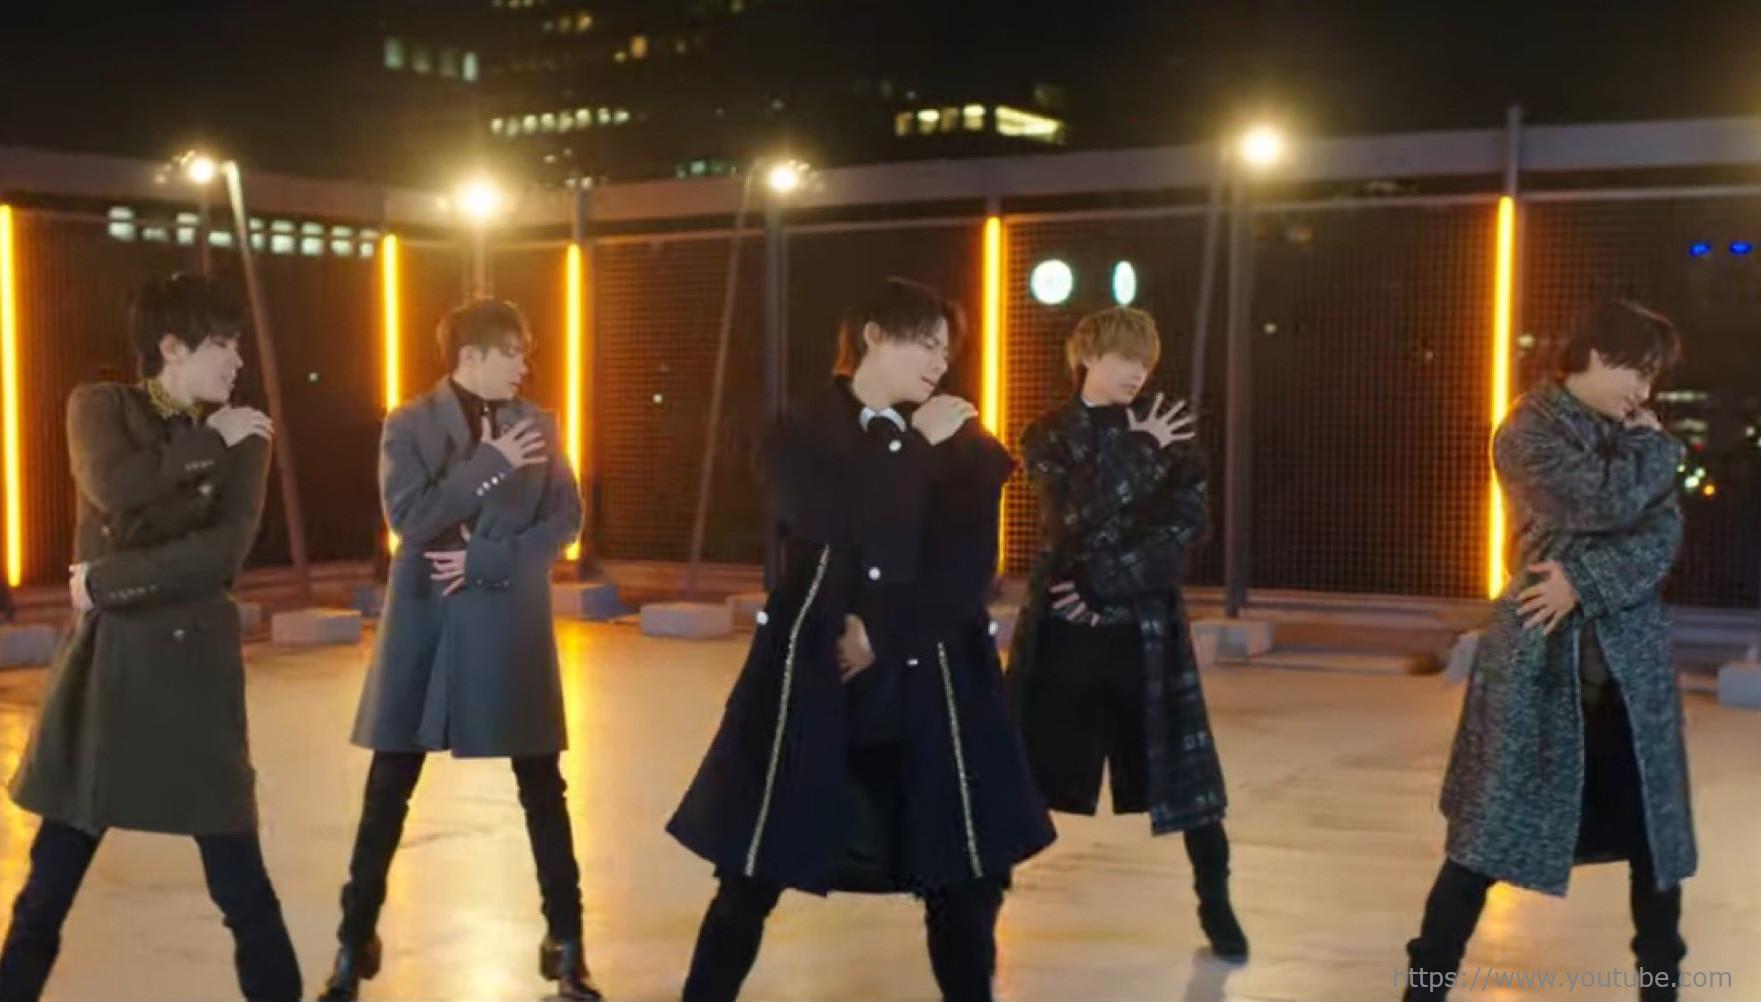 King&Prince(キンプリ) 6thシングル『I promise』MV解禁